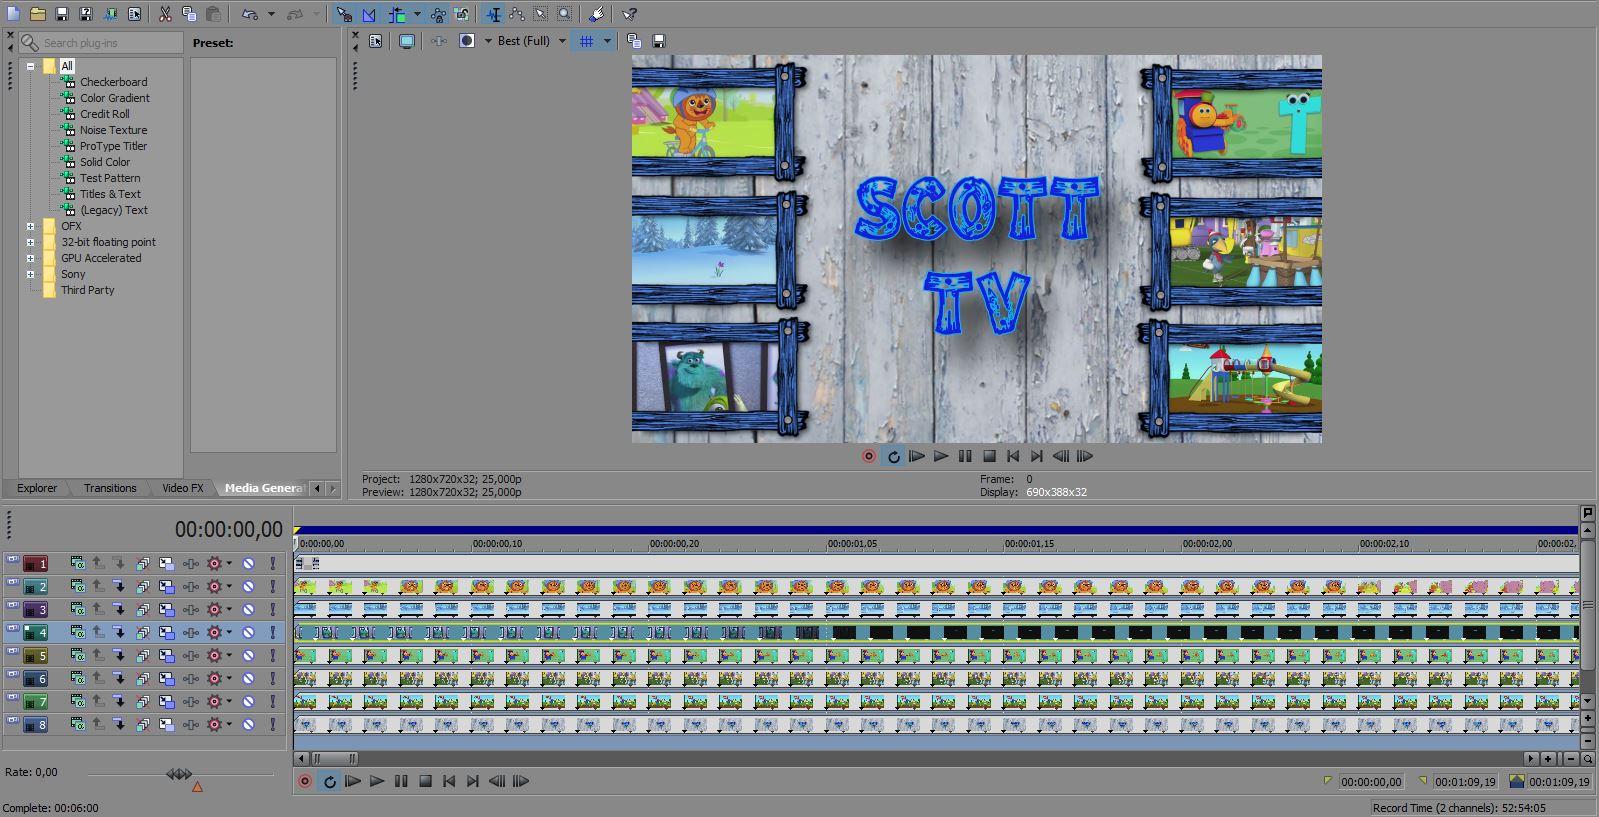 Alain\'s Projects: Scott TV